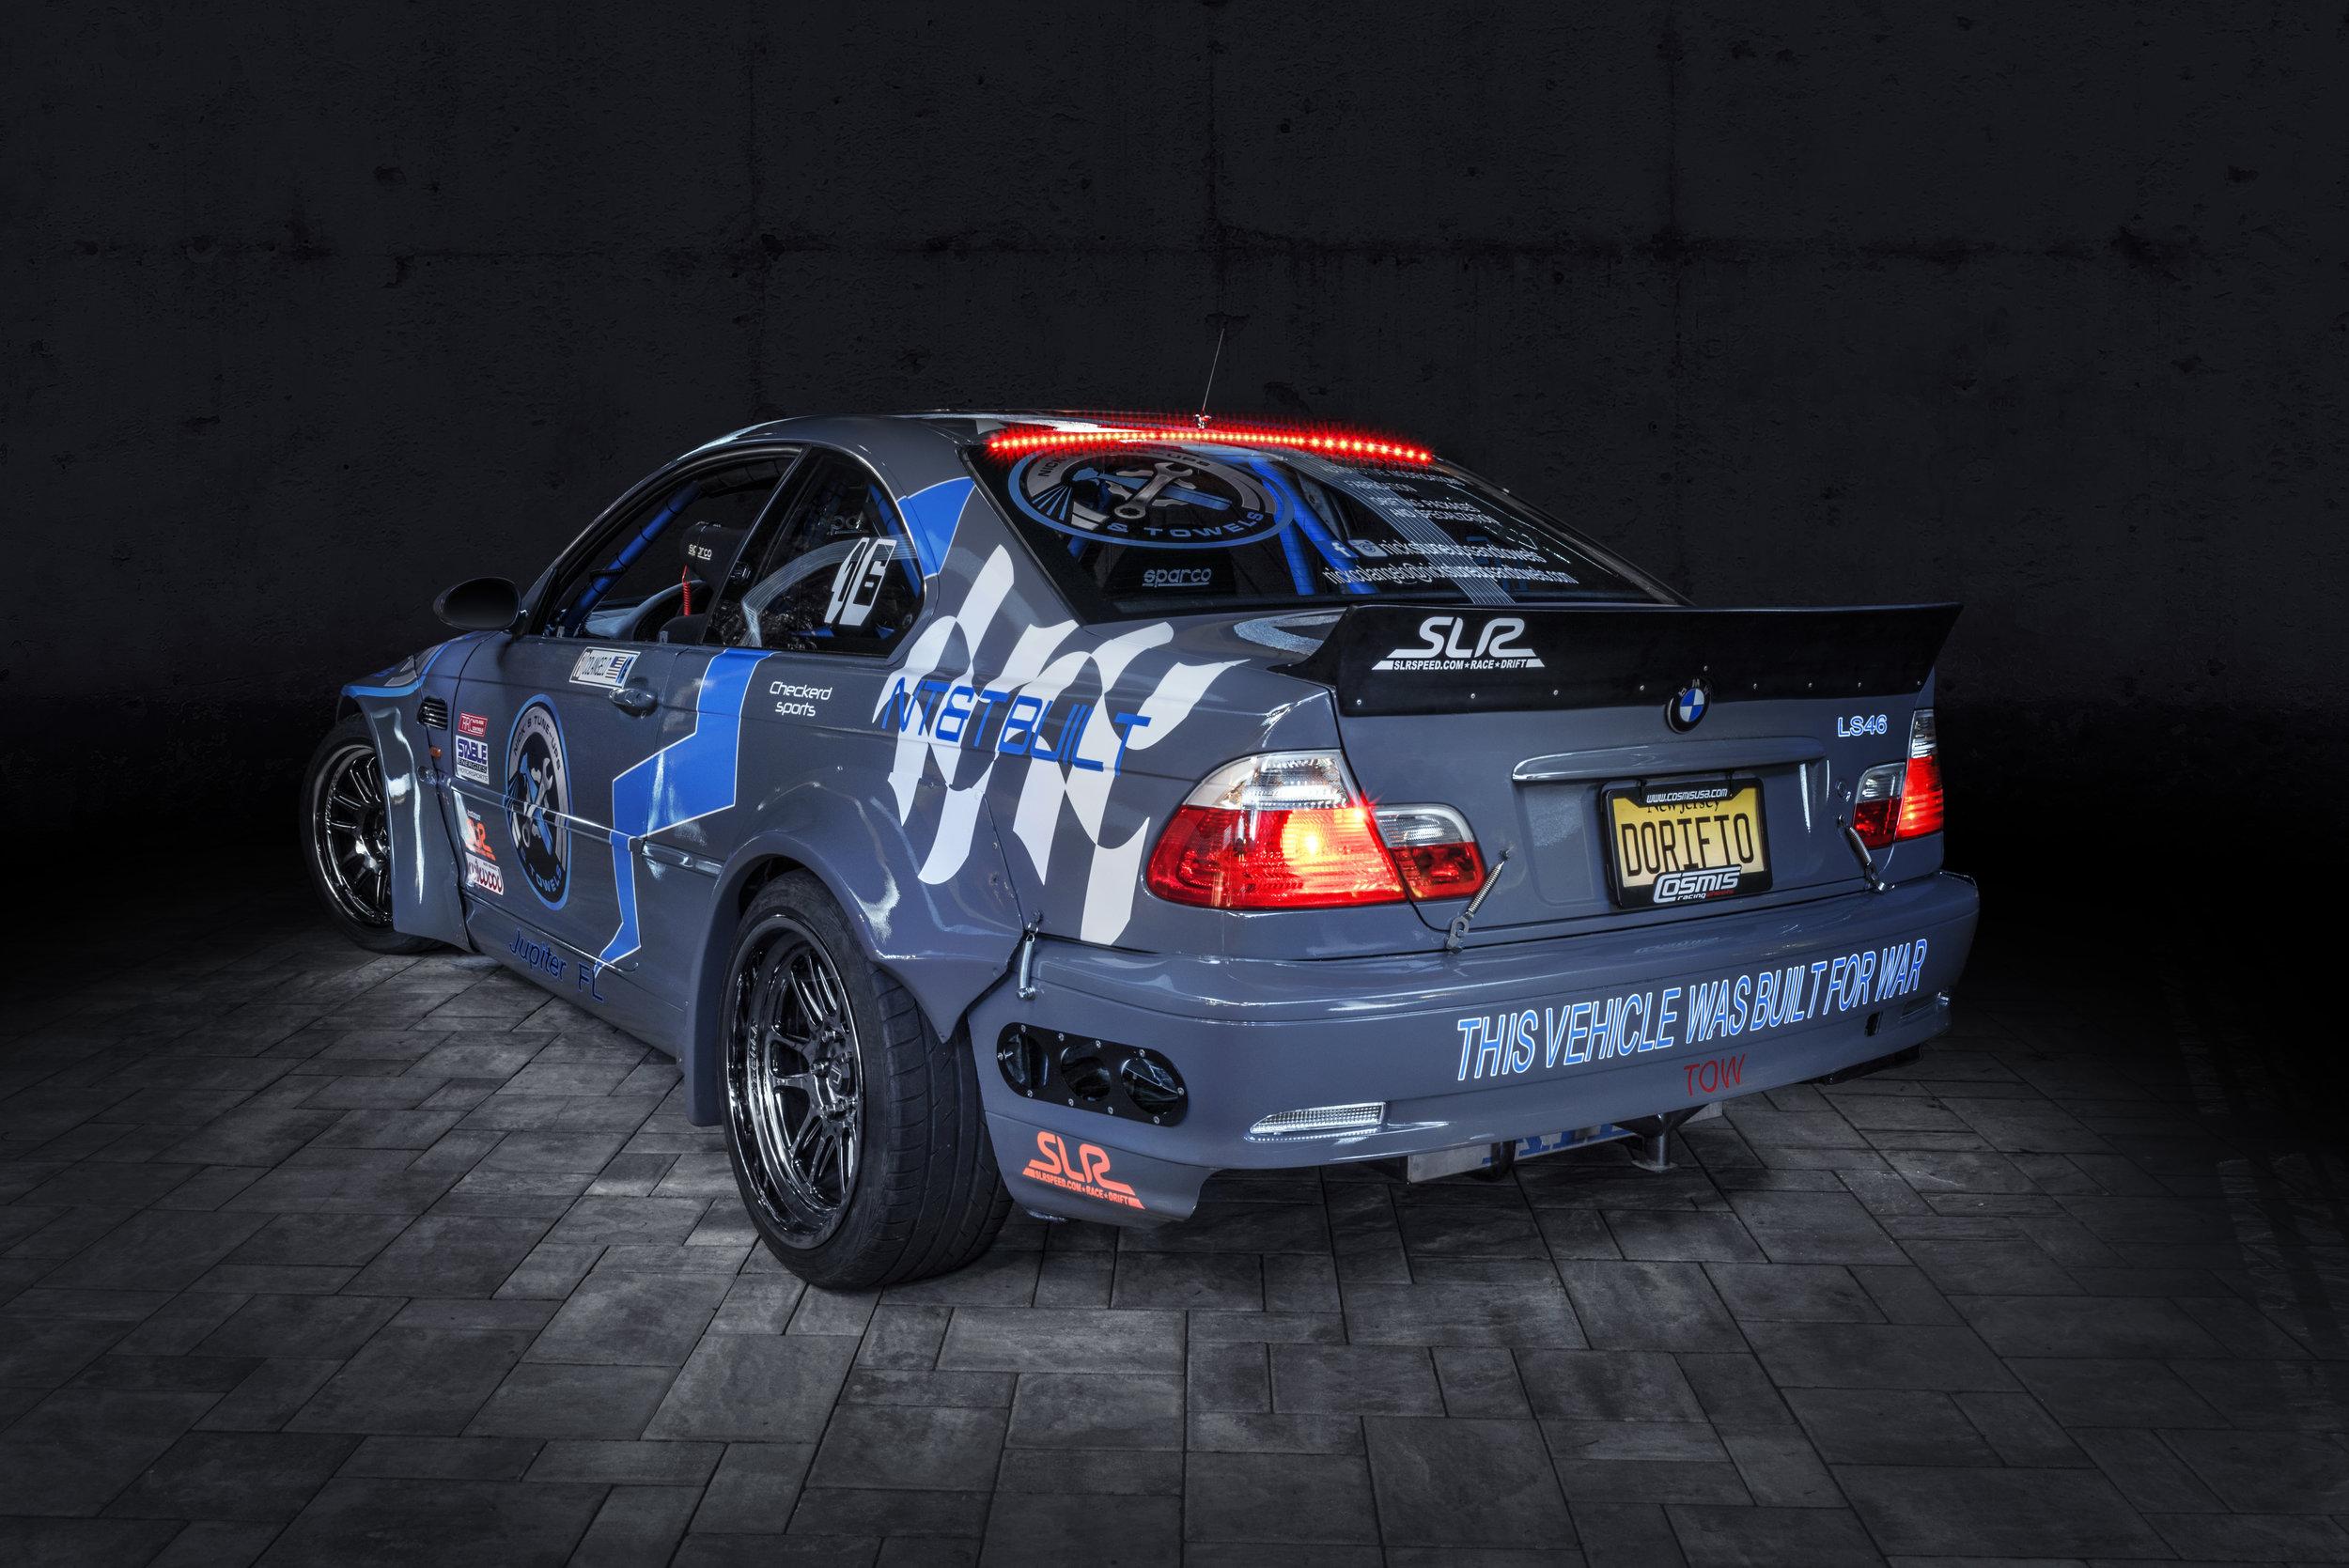 BMW004